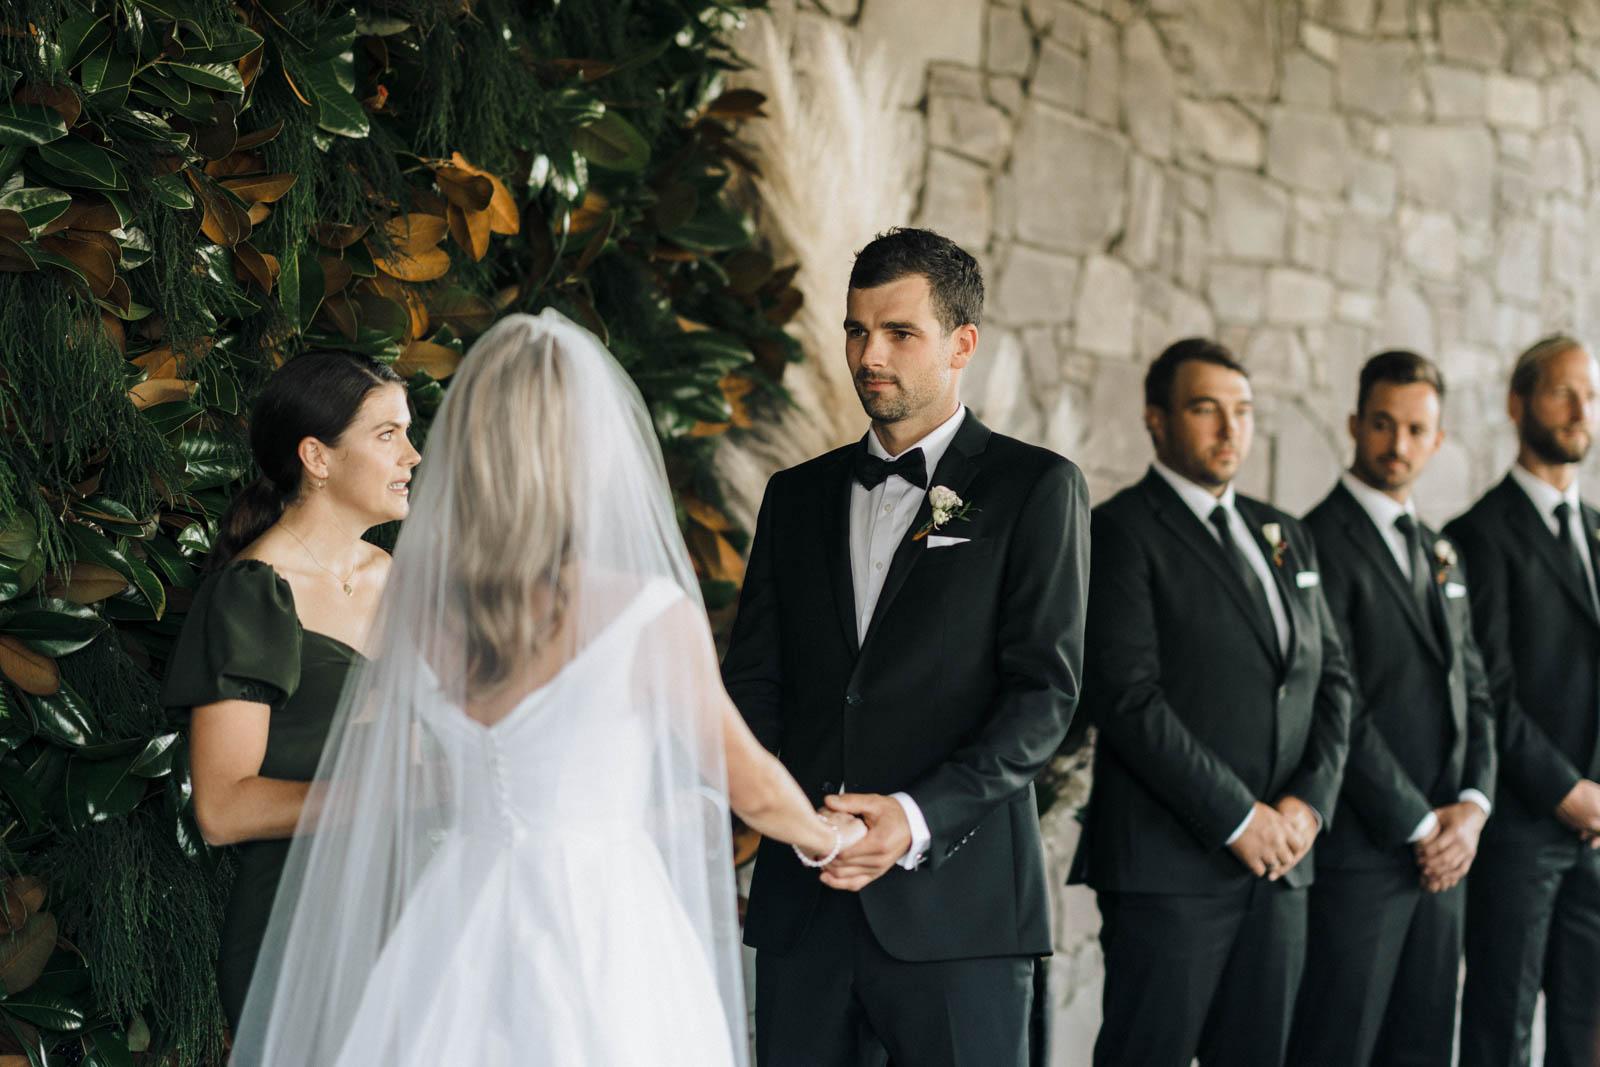 newfound-s-p-mt-maunganui-tauranga-wedding-photographer-1657-A9_06105